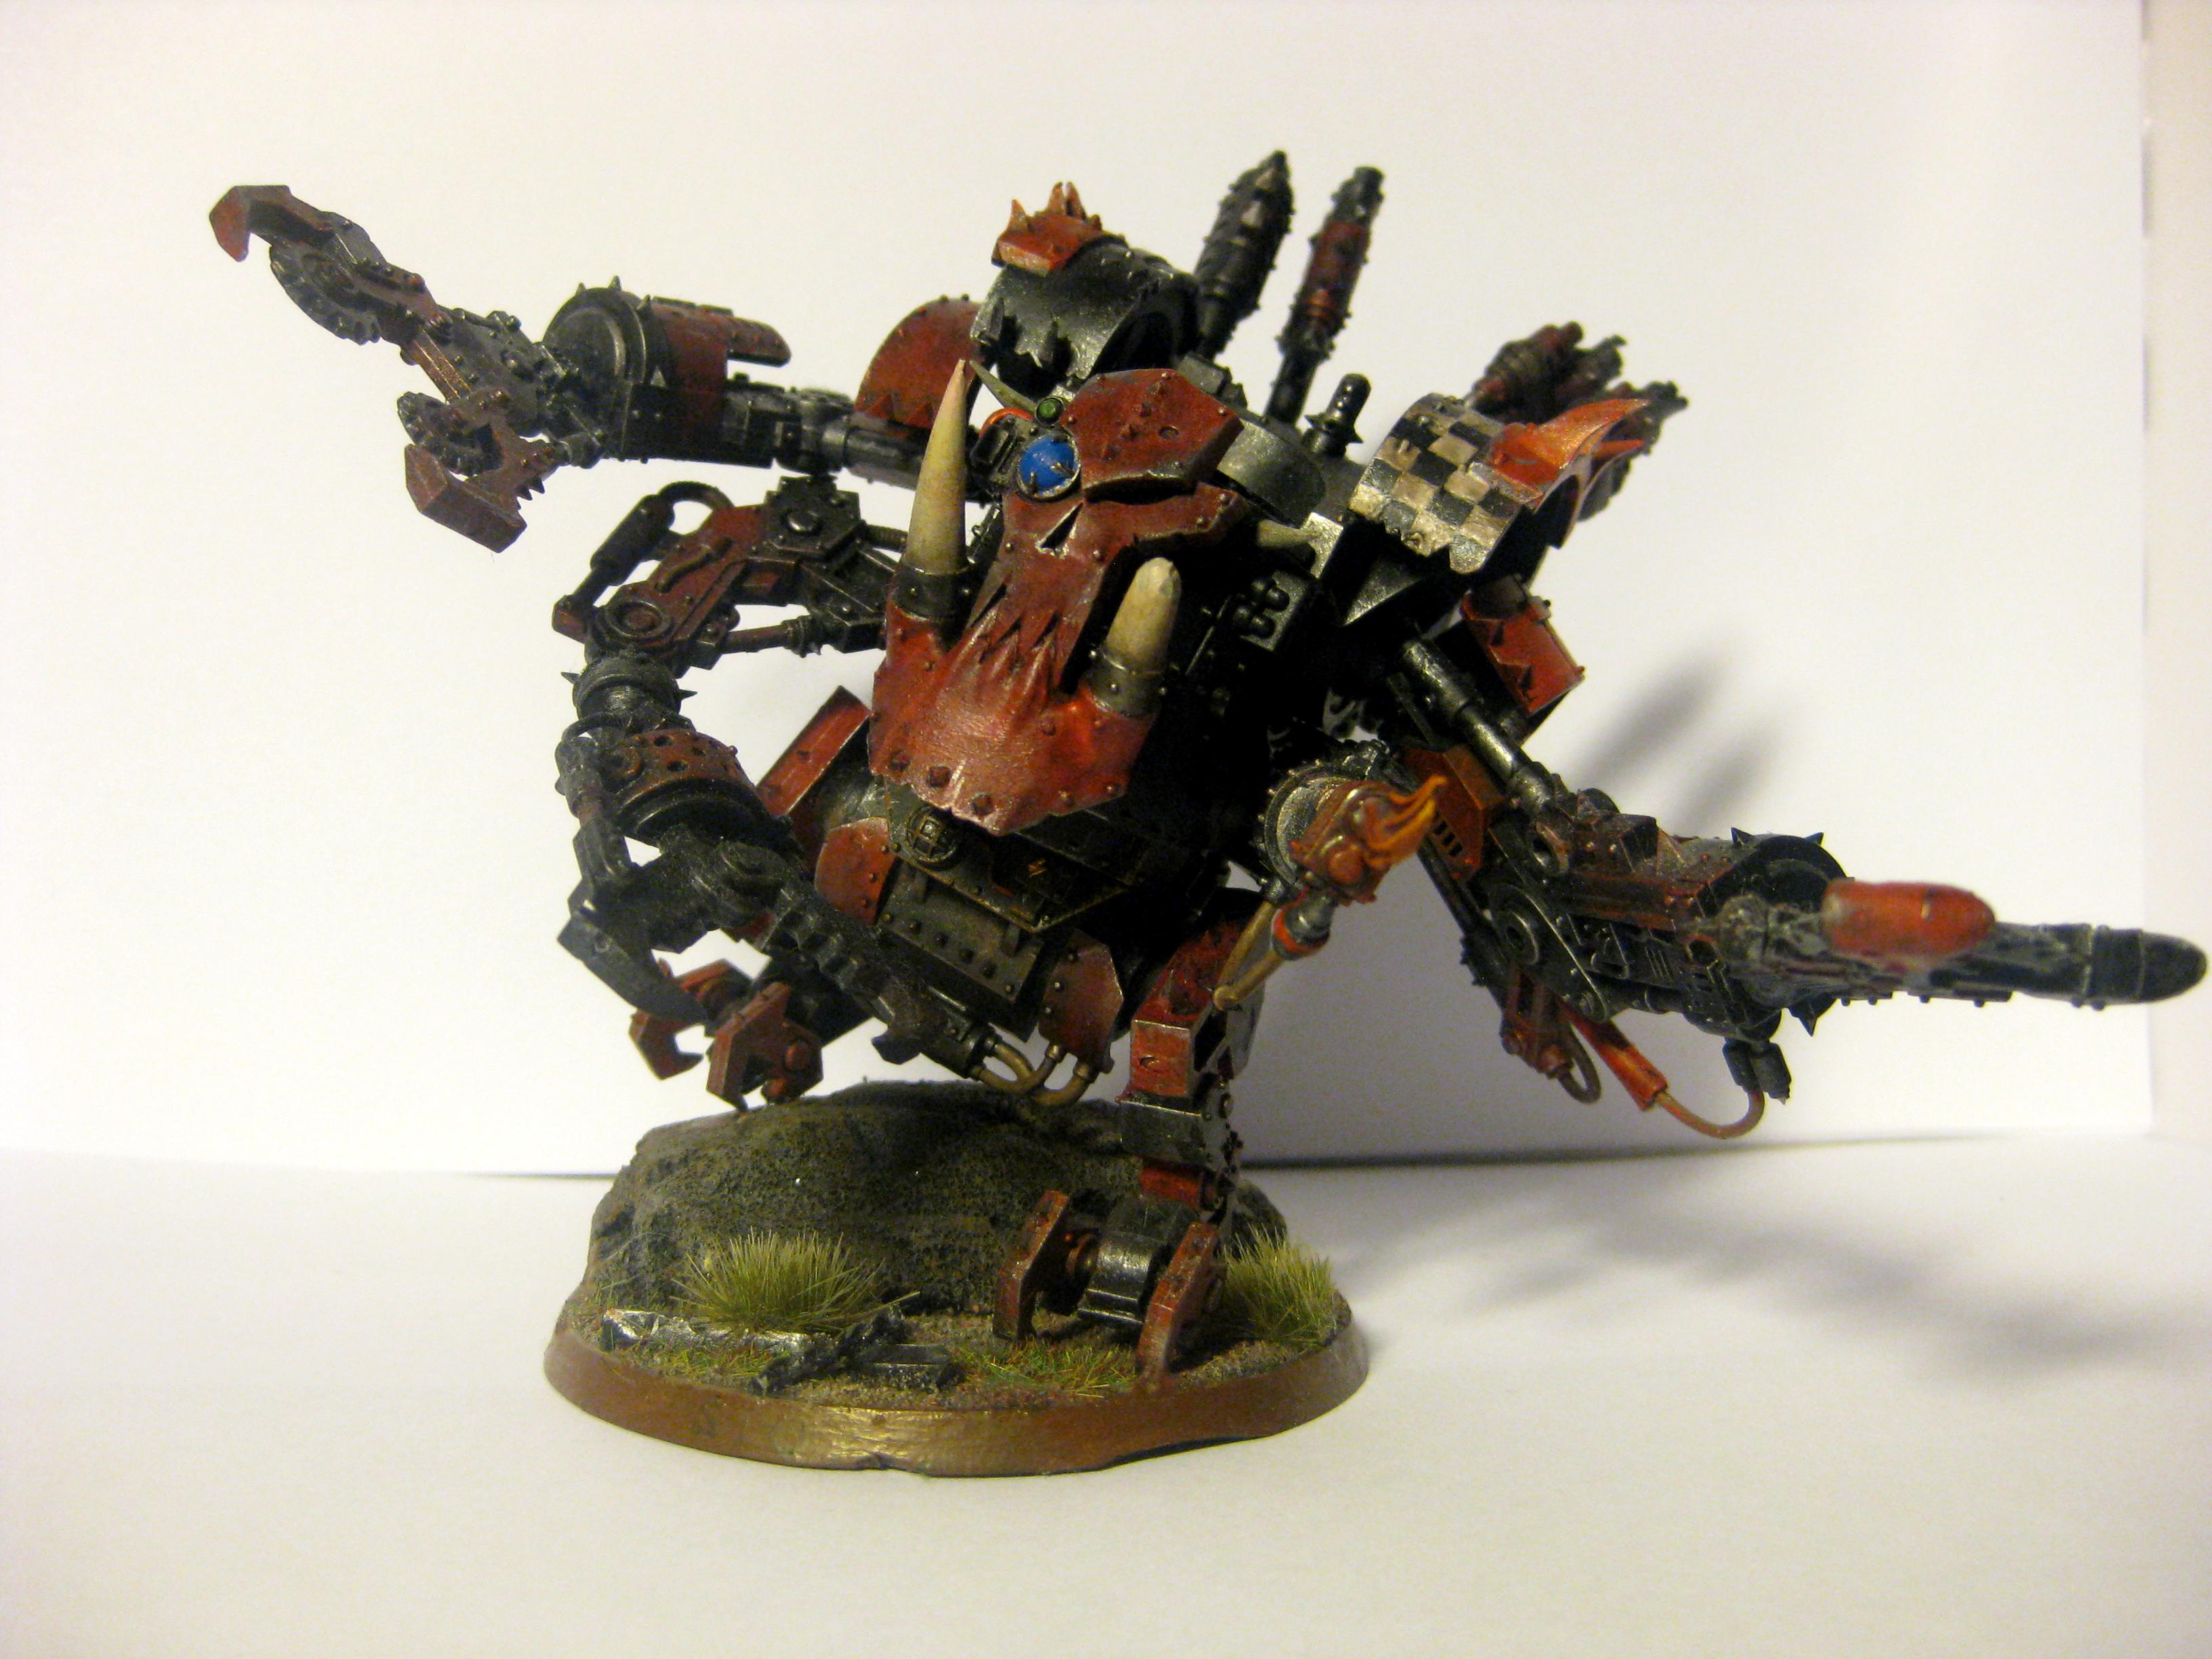 Deff Dread, Dreadnought, Evil Sunz, Orks, Stomp, Warhammer 40,000